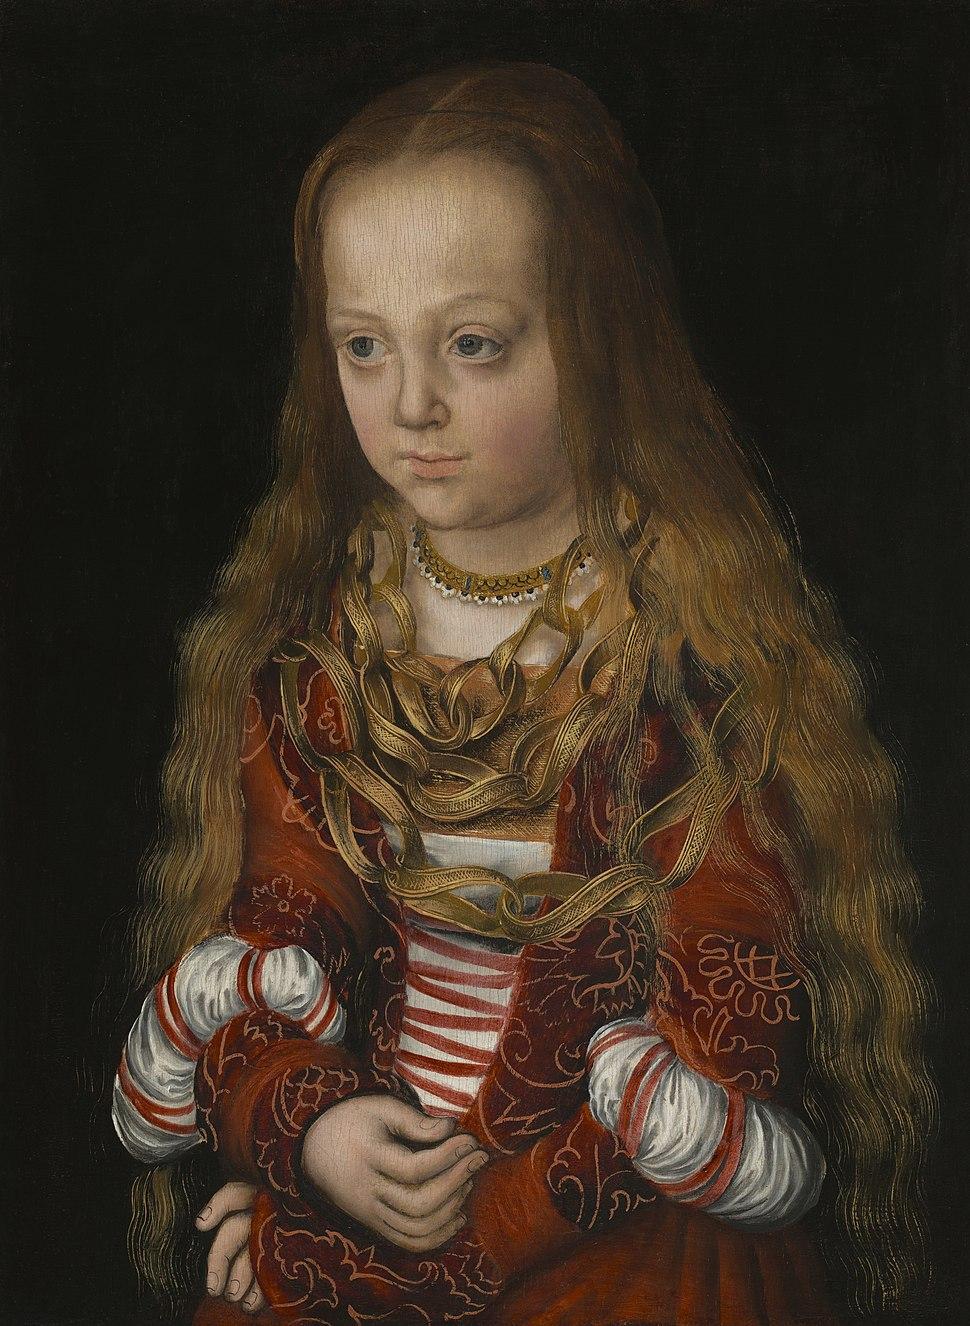 Lucas Cranach d. %C3%84. 052.jpg